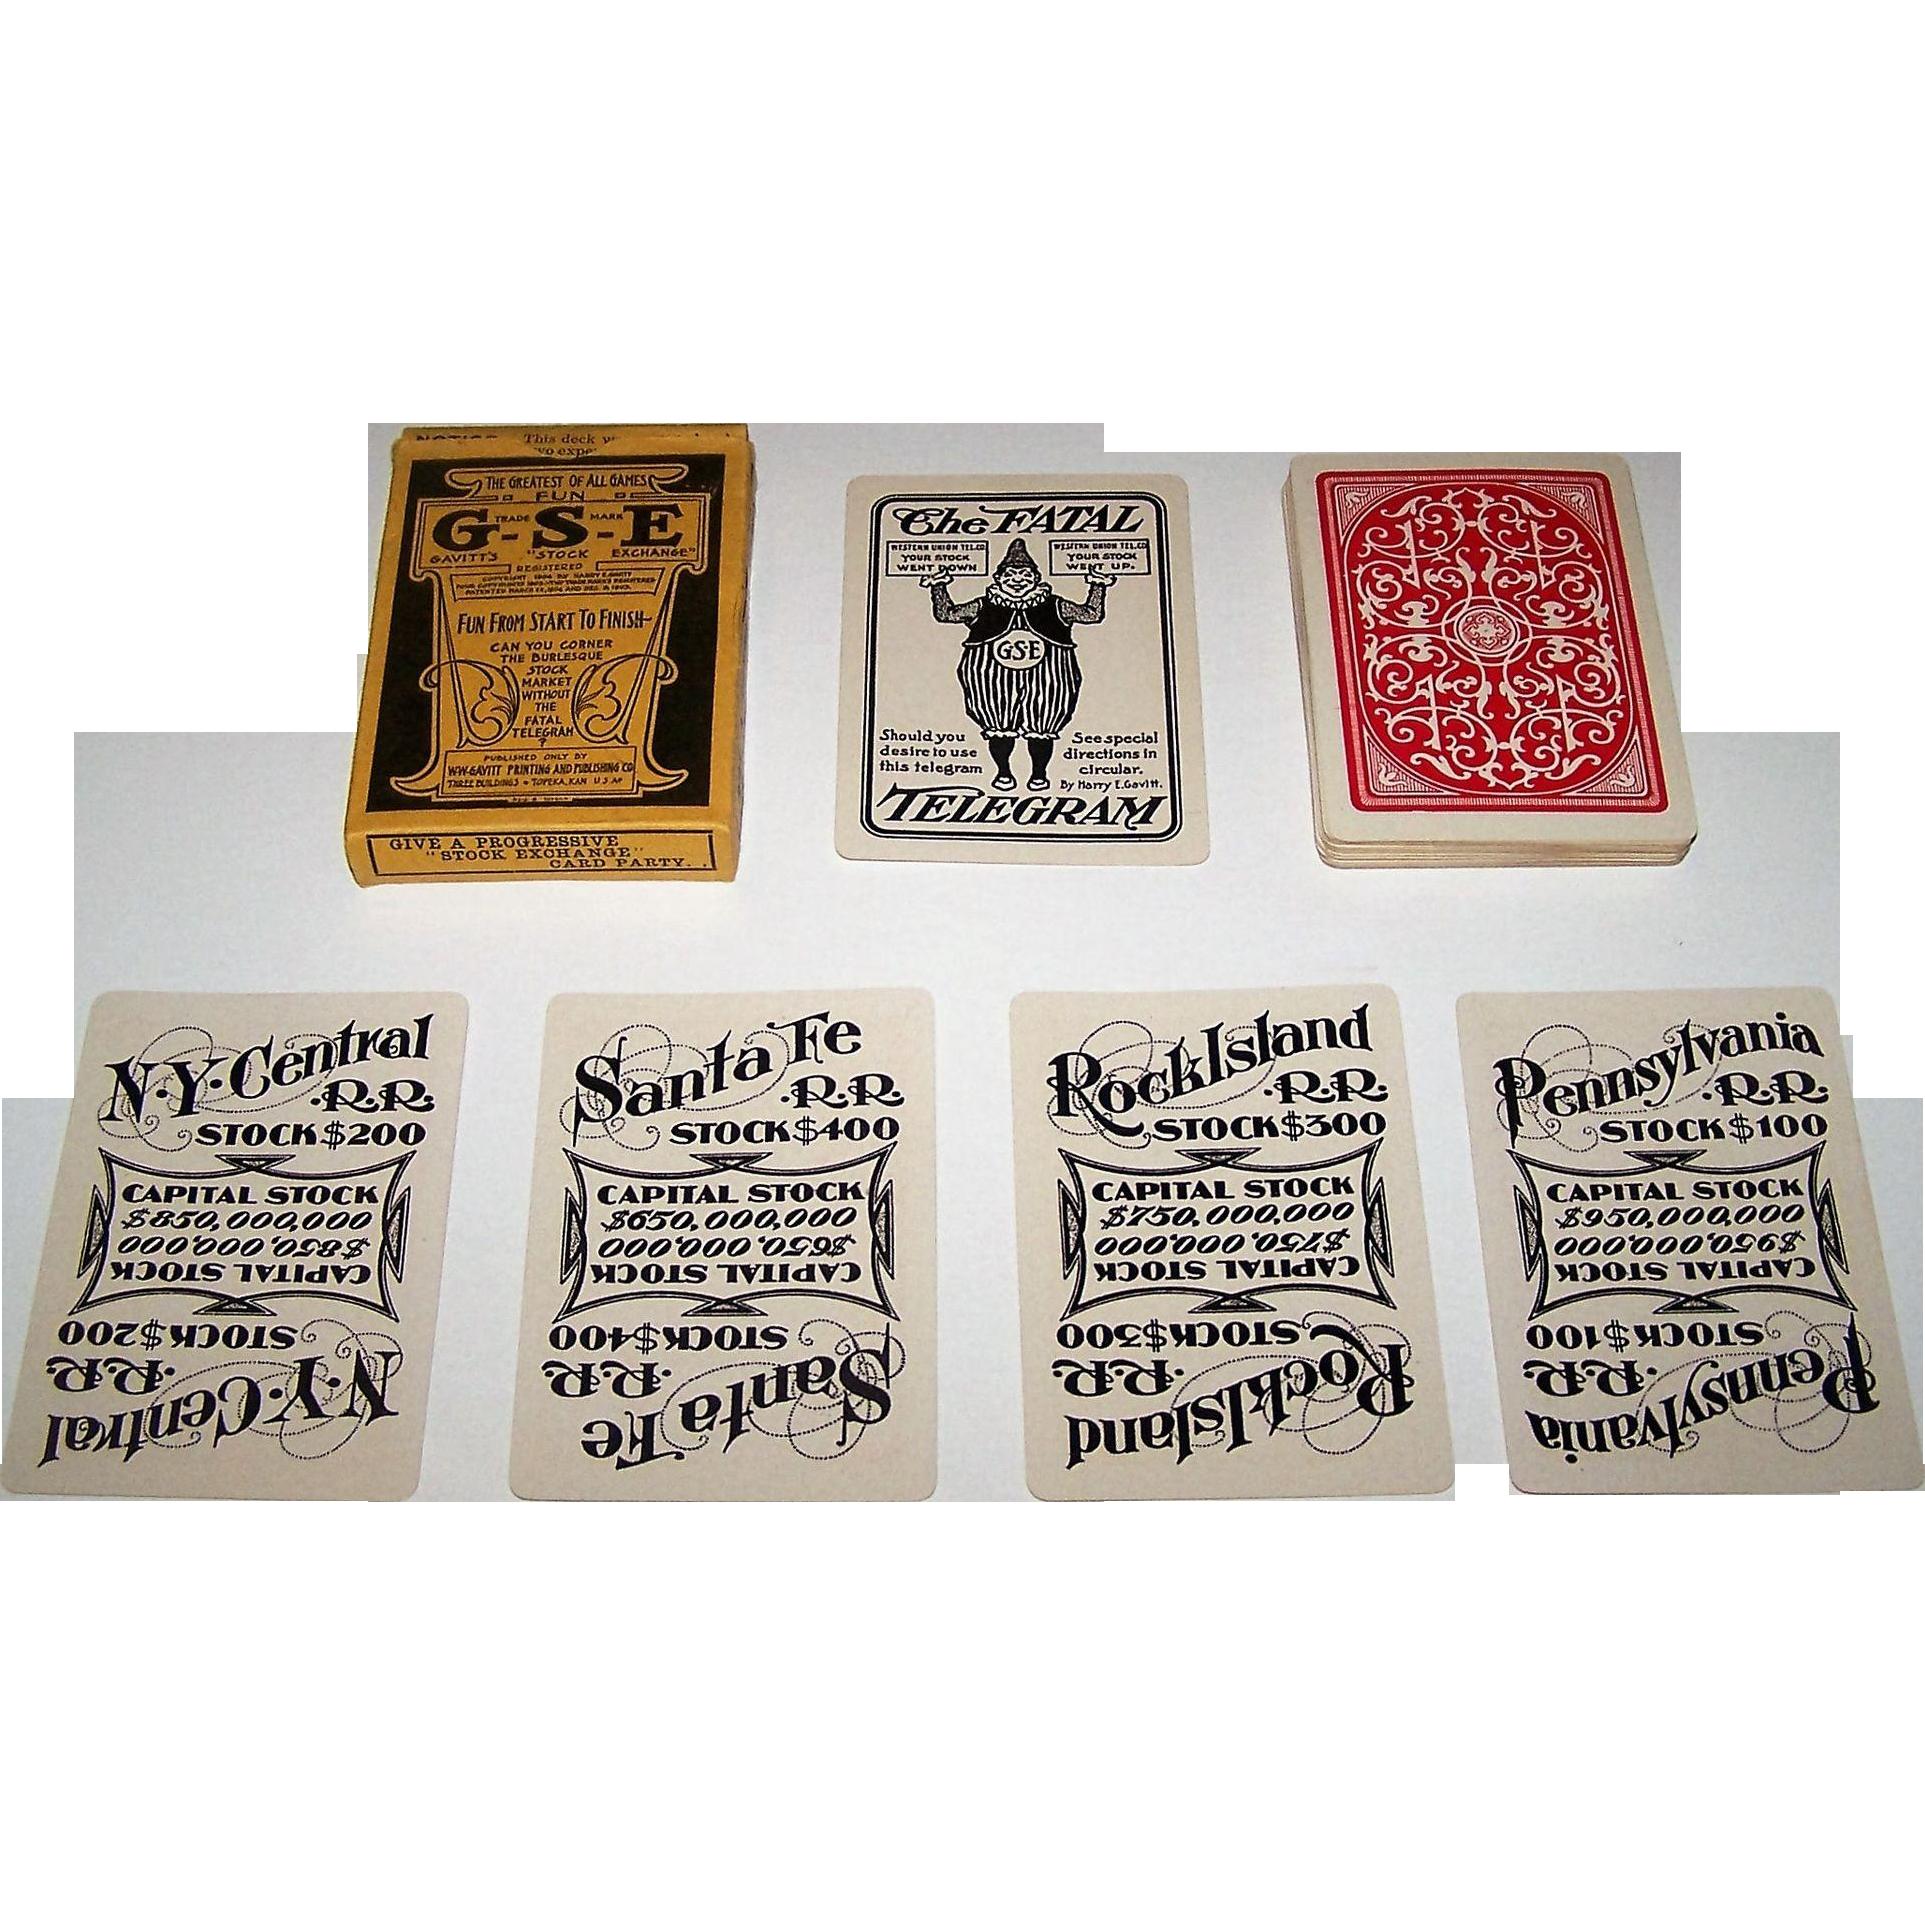 "W.W. Gavitt Printing and Publishing Co. ""Gavitt's Stock Exchange"" Card Game, c.1903"